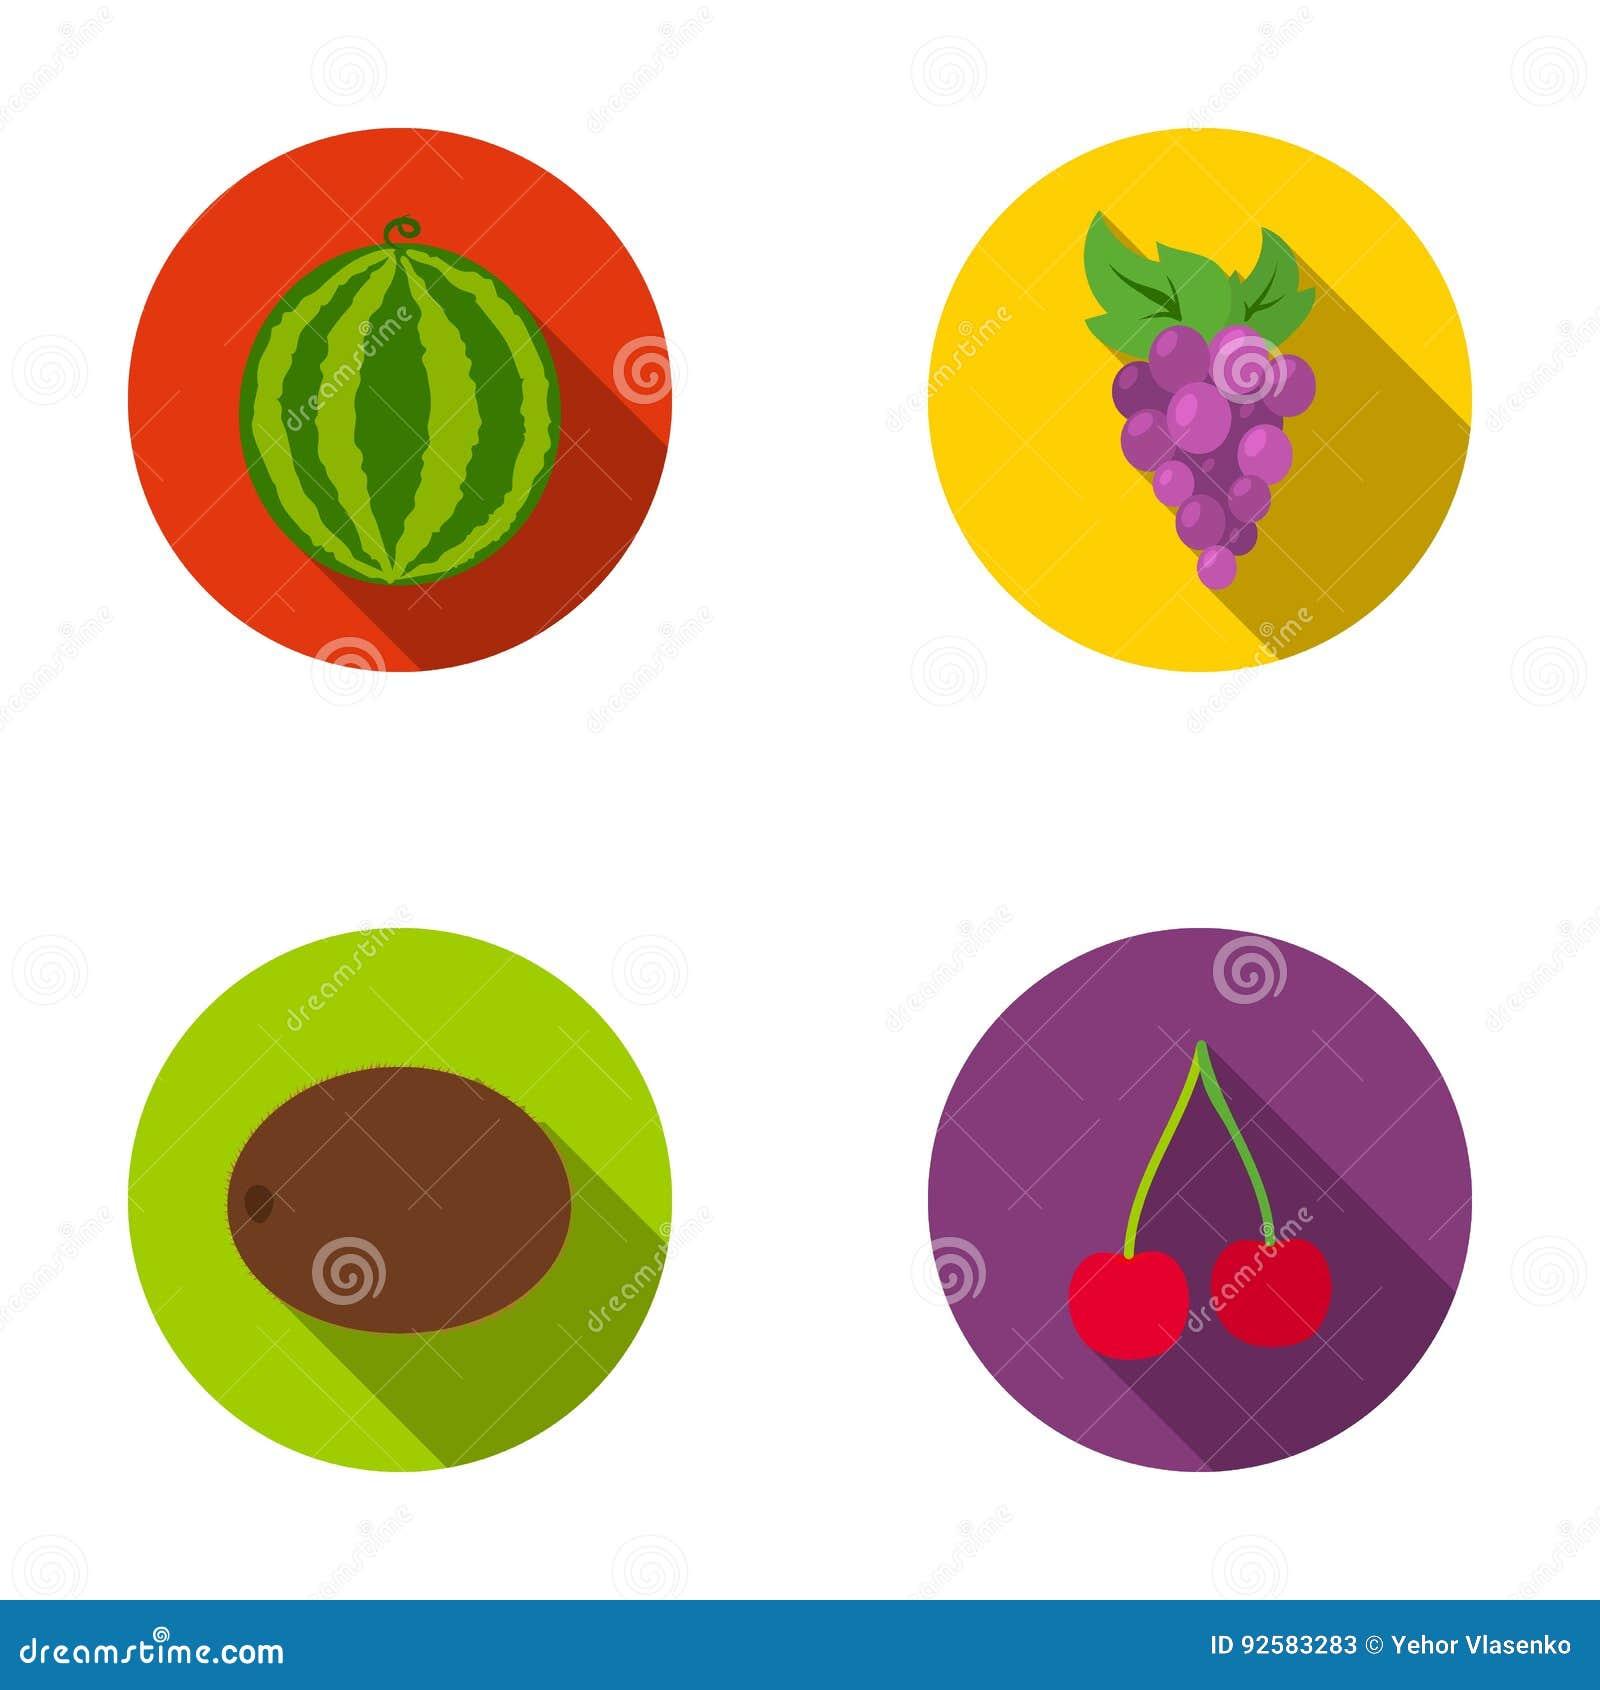 Арбуз, виноградины, вишня, киви Плодоовощи установили значки собрания в плоской сети иллюстрации запаса символа вектора стиля